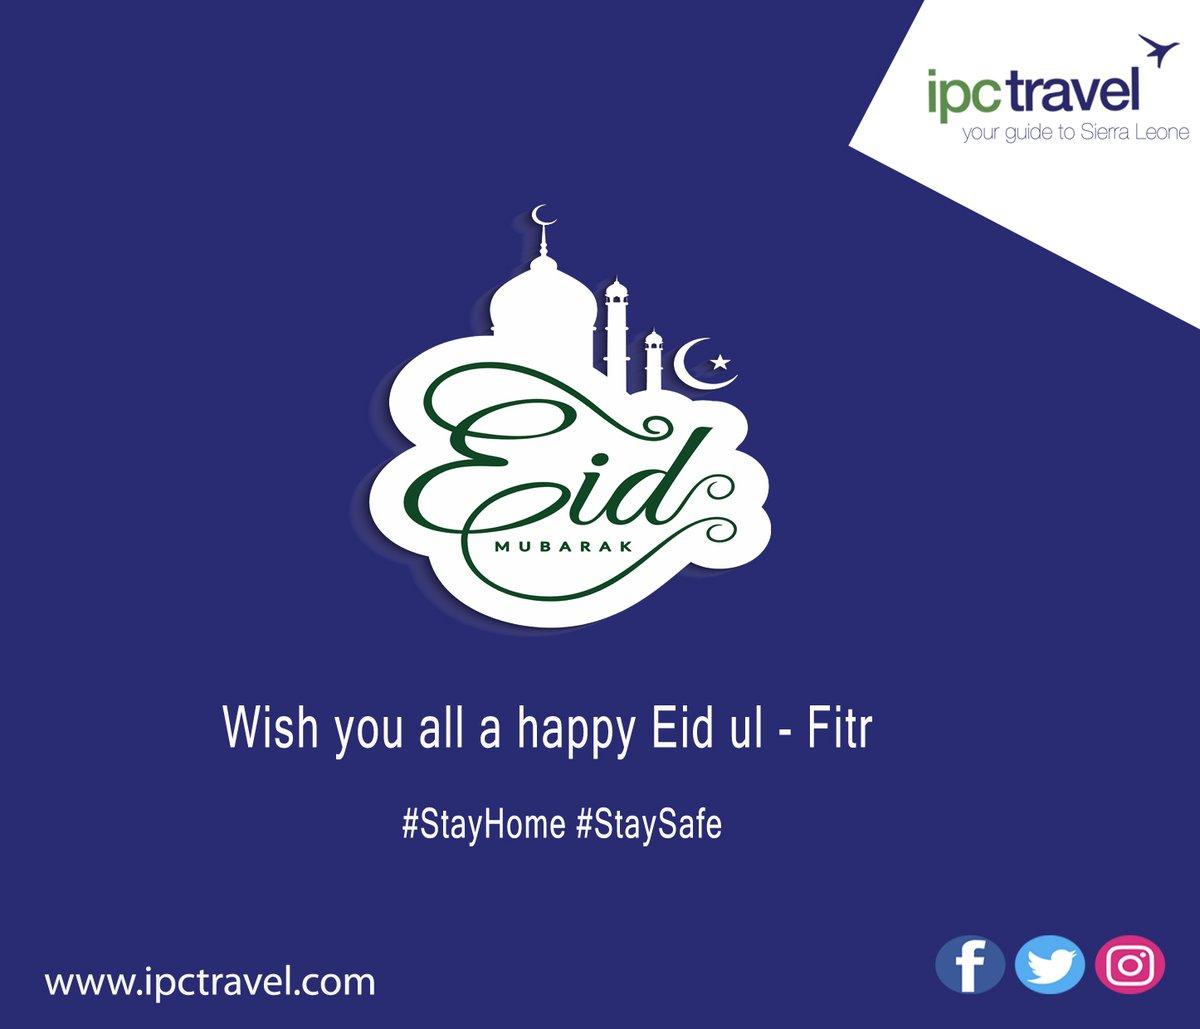 Eid Mubarak to All 🌙 May this day bring peace, happiness and prosperity to everyone  #ipctravel #yourguidetosierraleone #yourguidetotheworld #eidmubarak #eidulfitr #ramadankareem #staysafe #stayhome #sierraleone  #SaloneTwitter https://t.co/LVSQGPNWKG